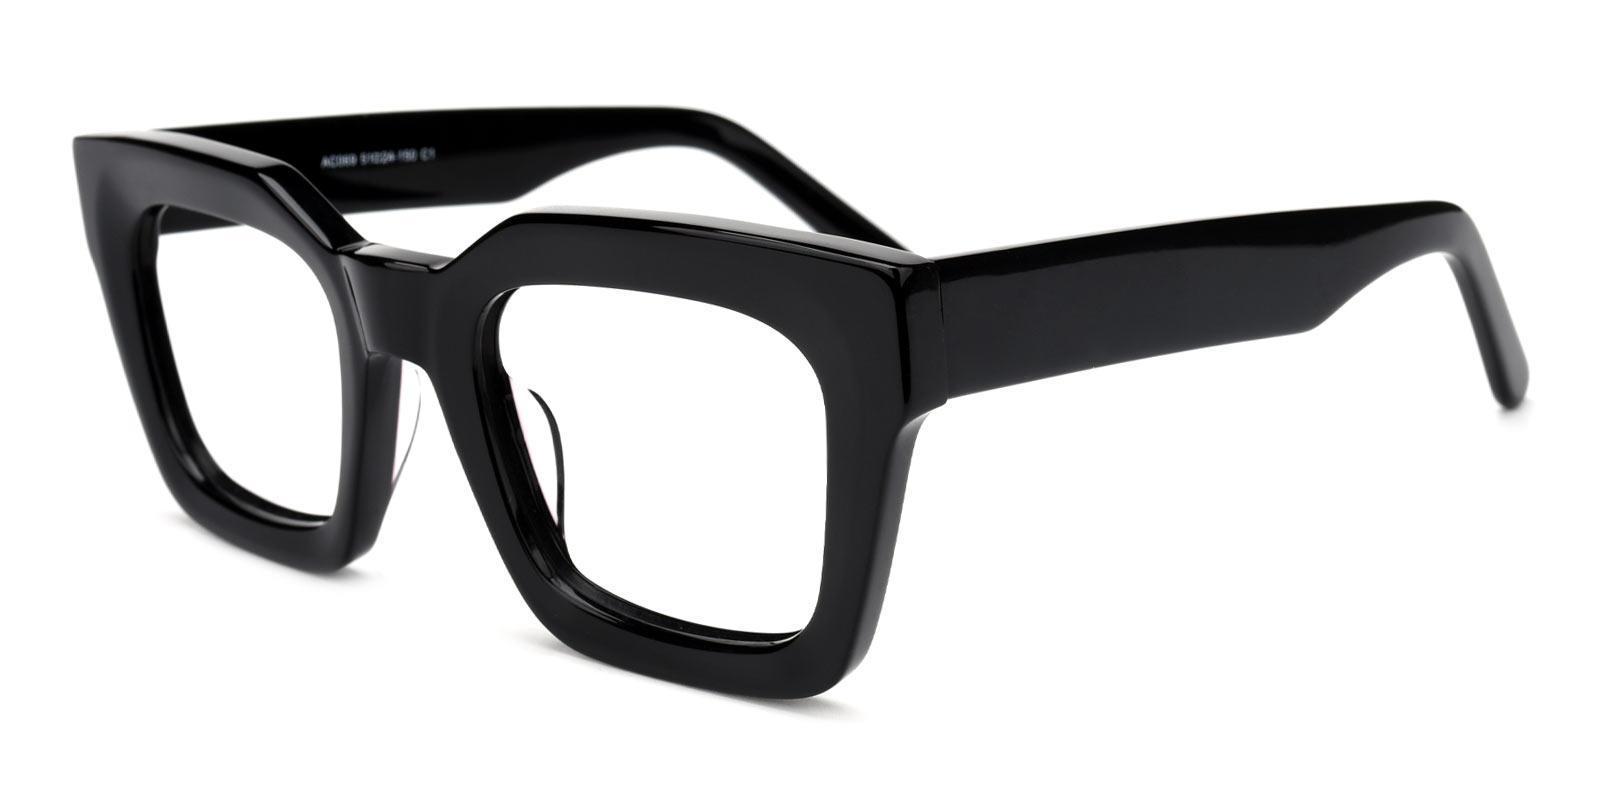 Esther-Black-Geometric-Acetate-Eyeglasses-additional1